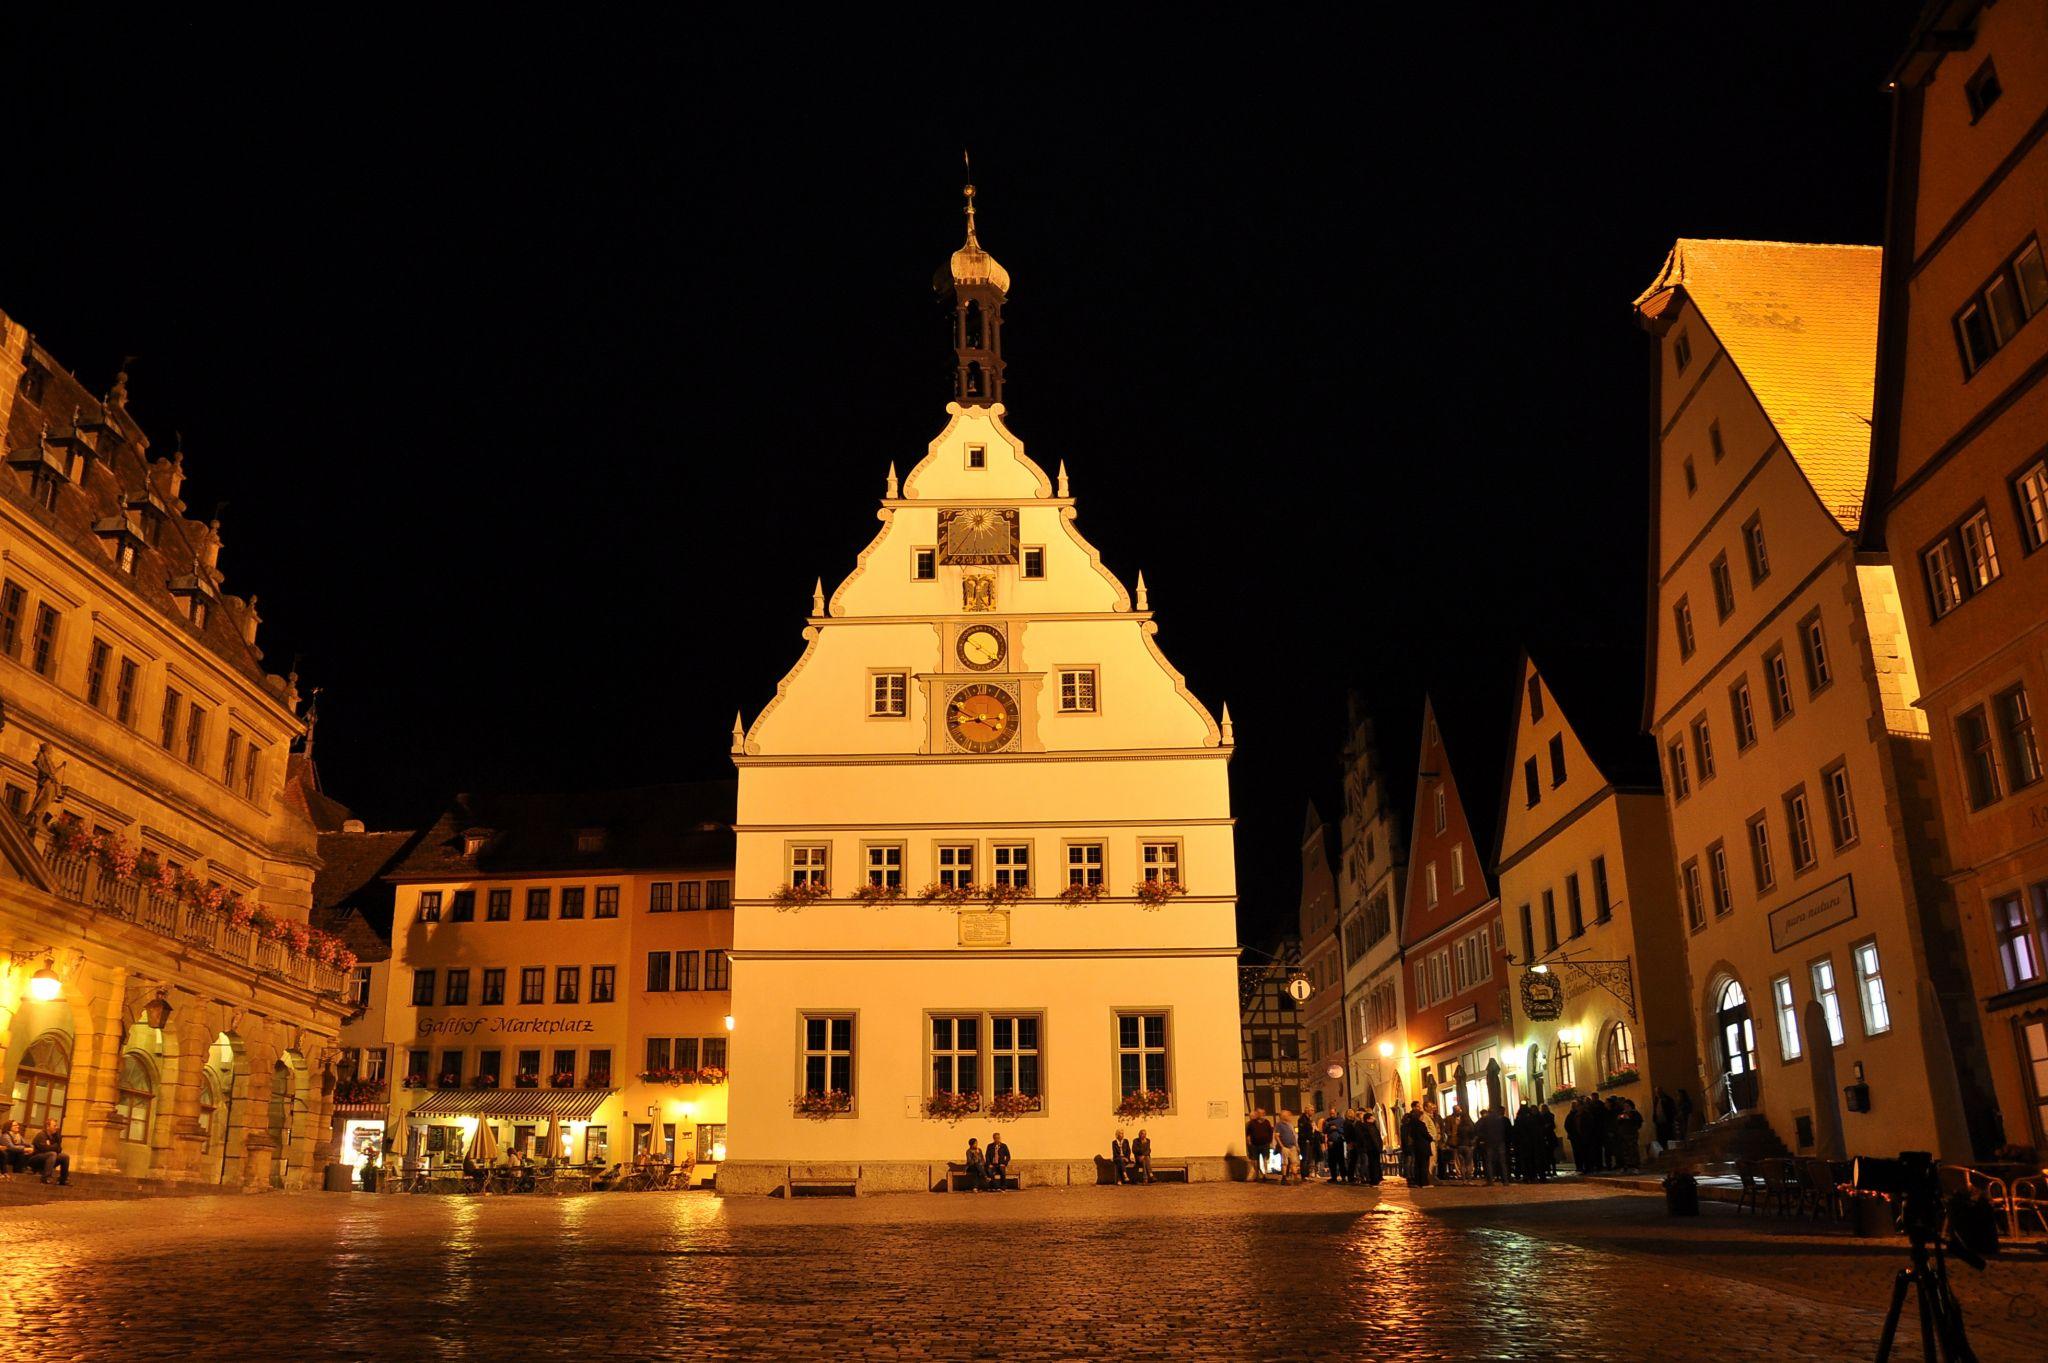 Marktplatz in the evening, Germany